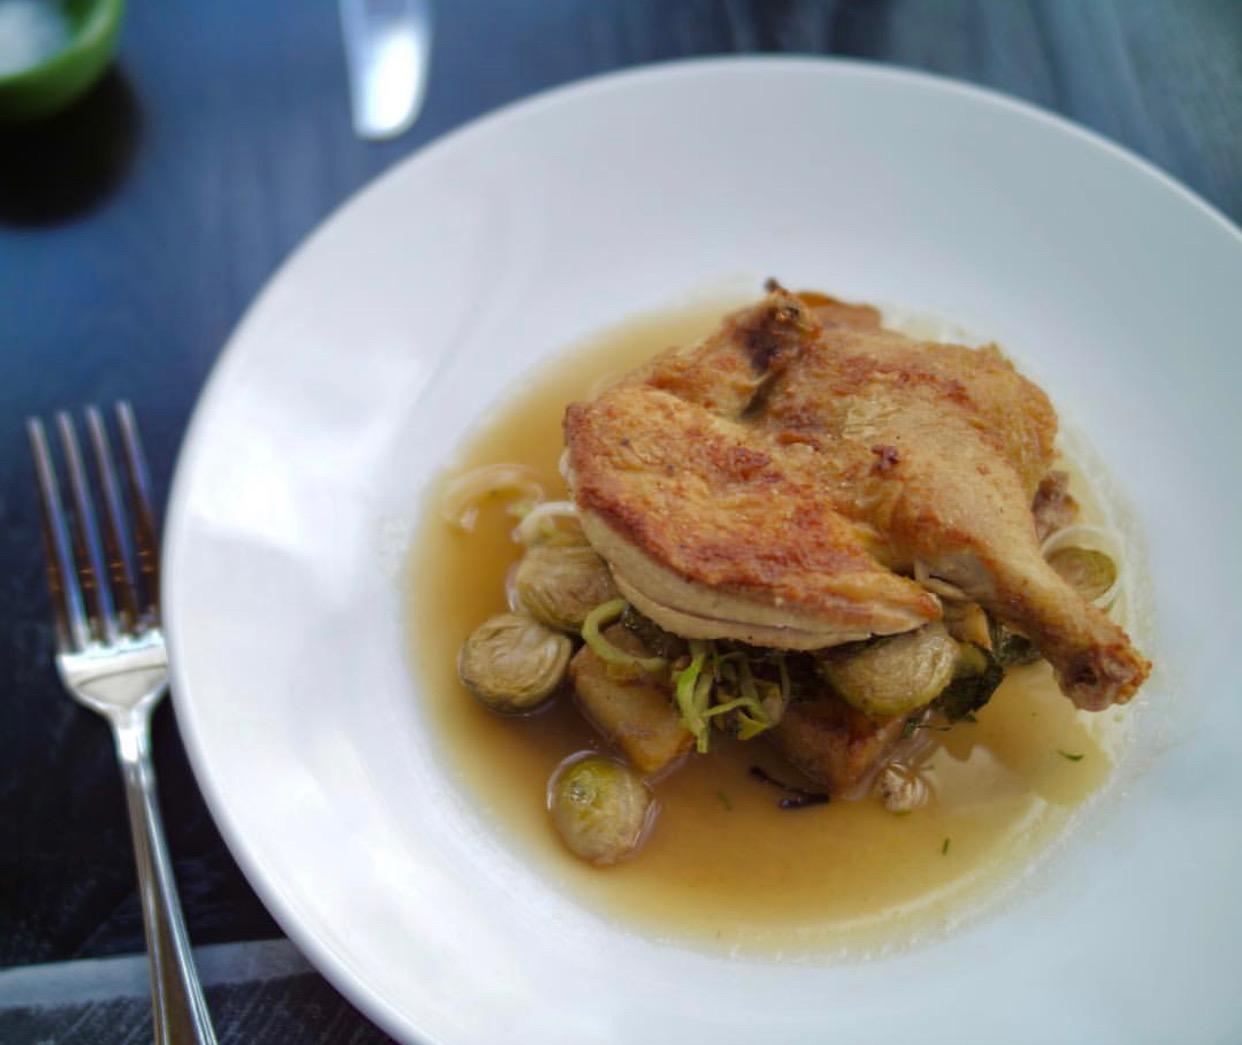 Crispy chicken, photo courtesy of Little Owl.